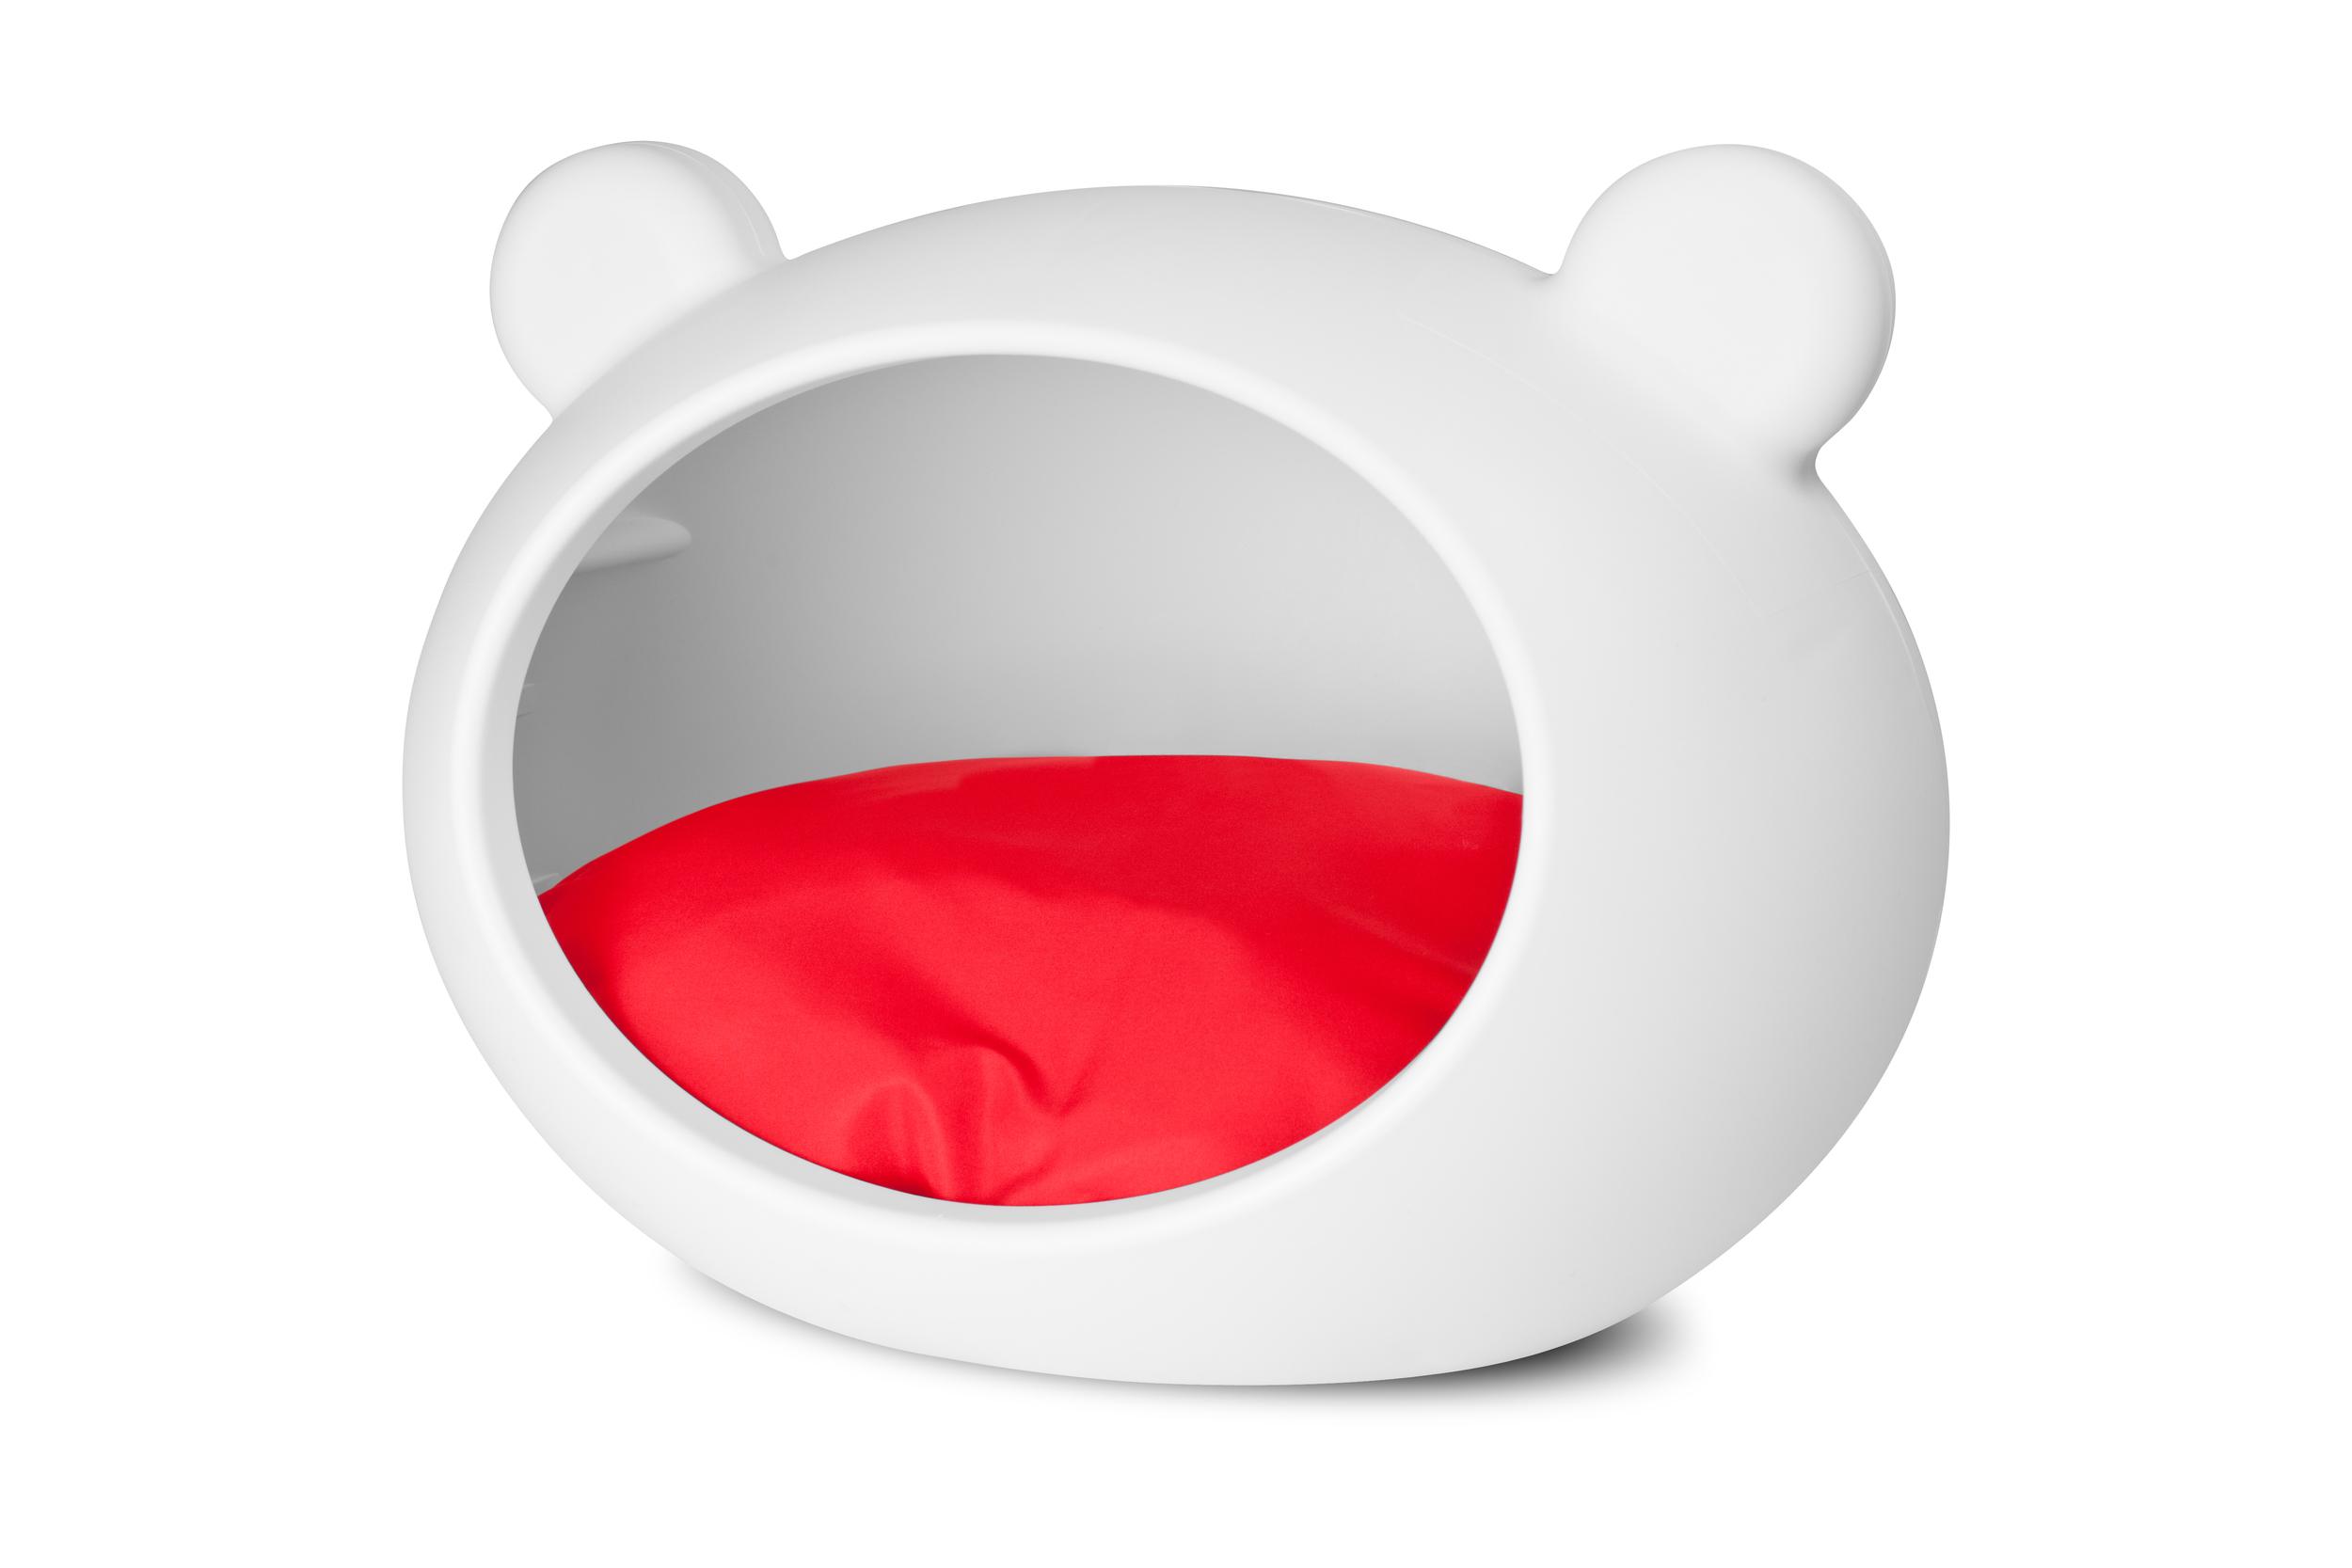 white_dog_bed_red_cushion.jpg